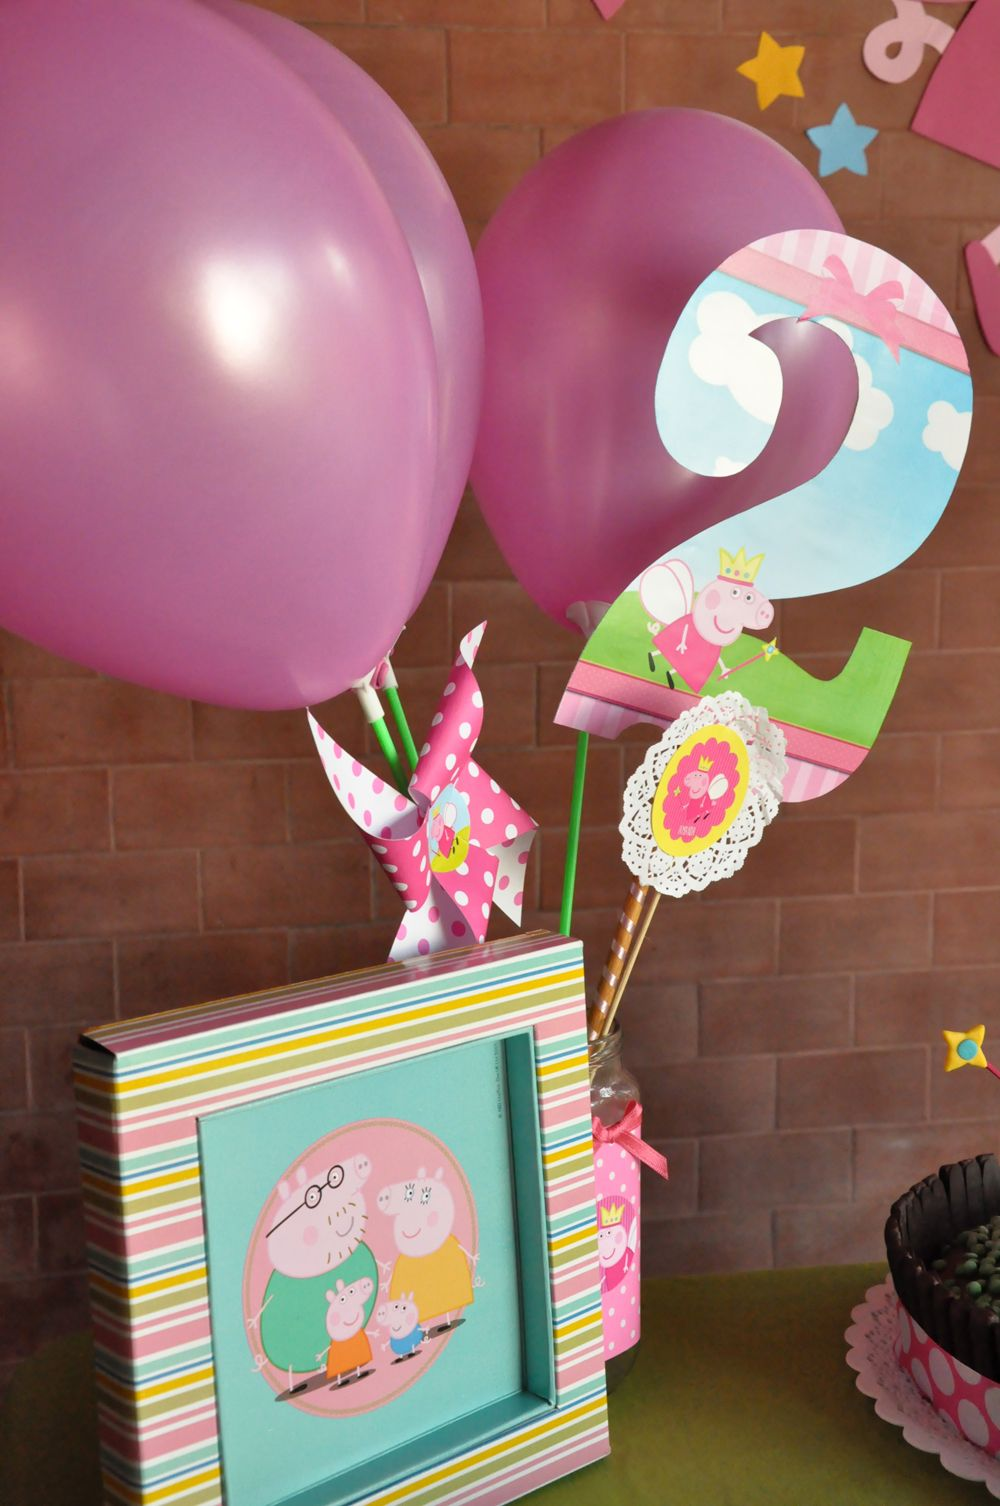 algunas ideas para decorar un cumple infantil con temtica peppa pig princesa